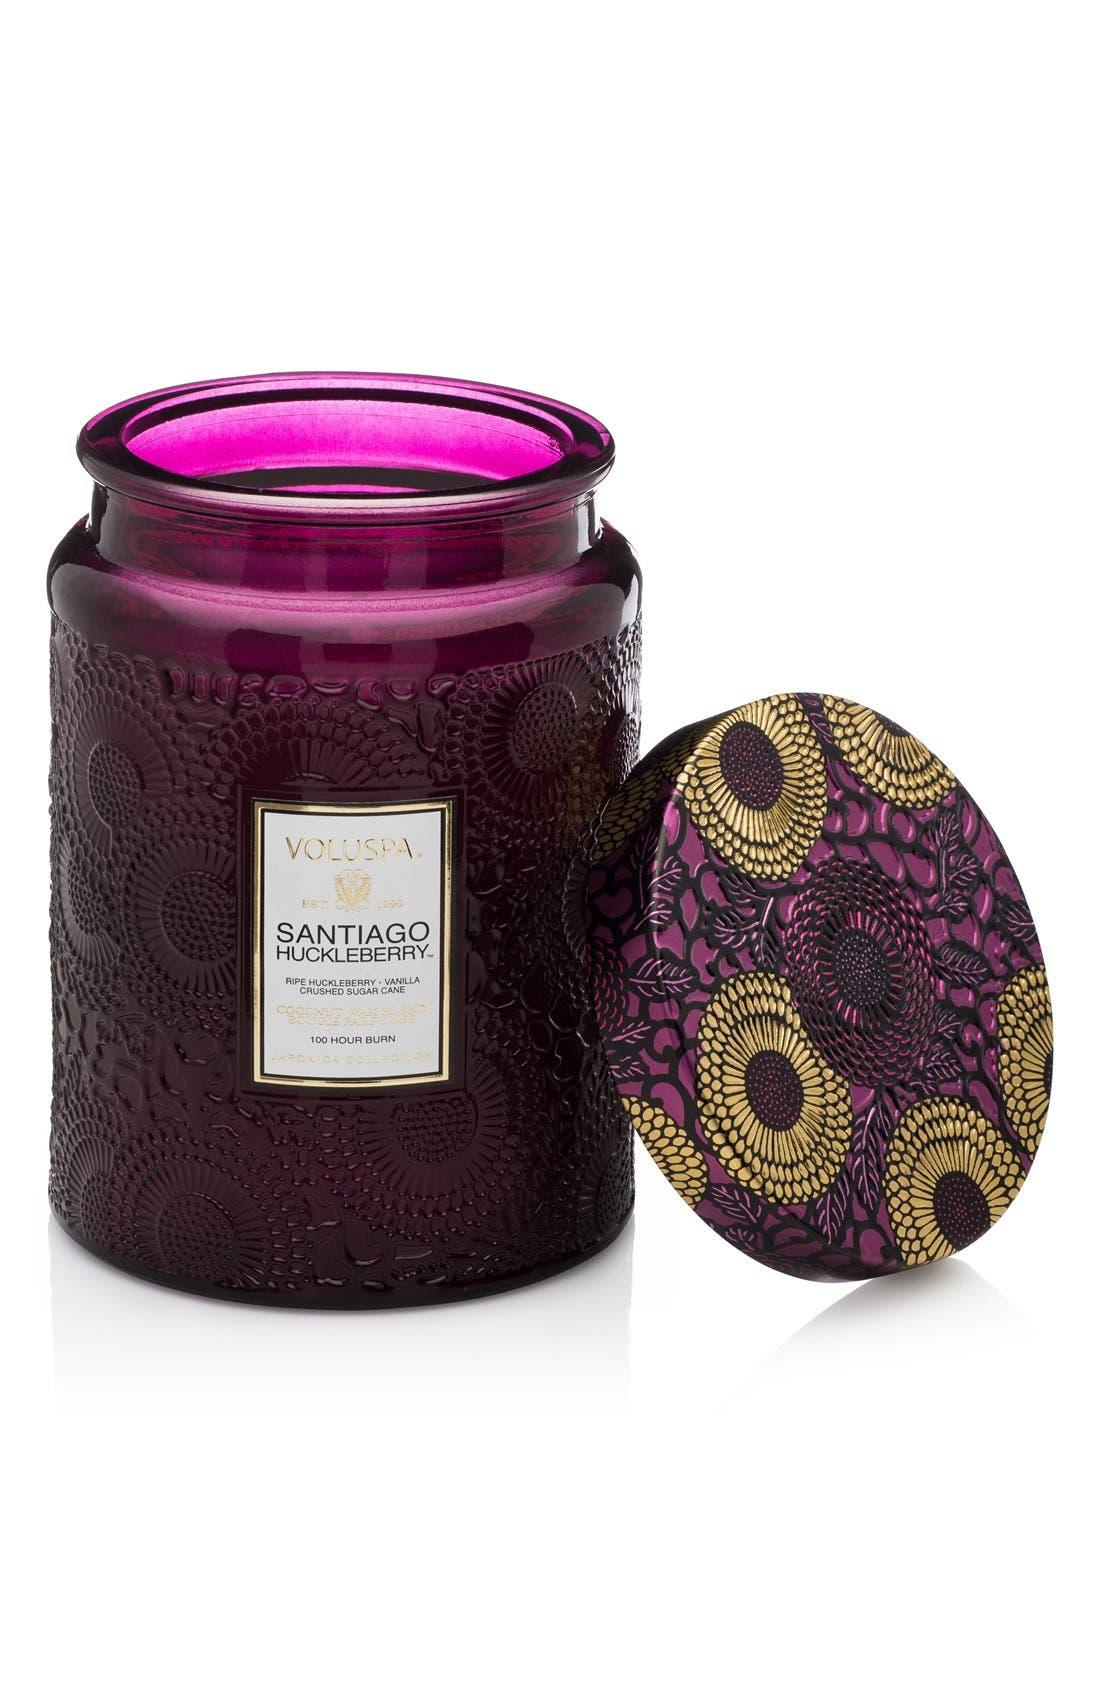 Voluspa Japonica Santiago Huckleberry Large Jar Candle